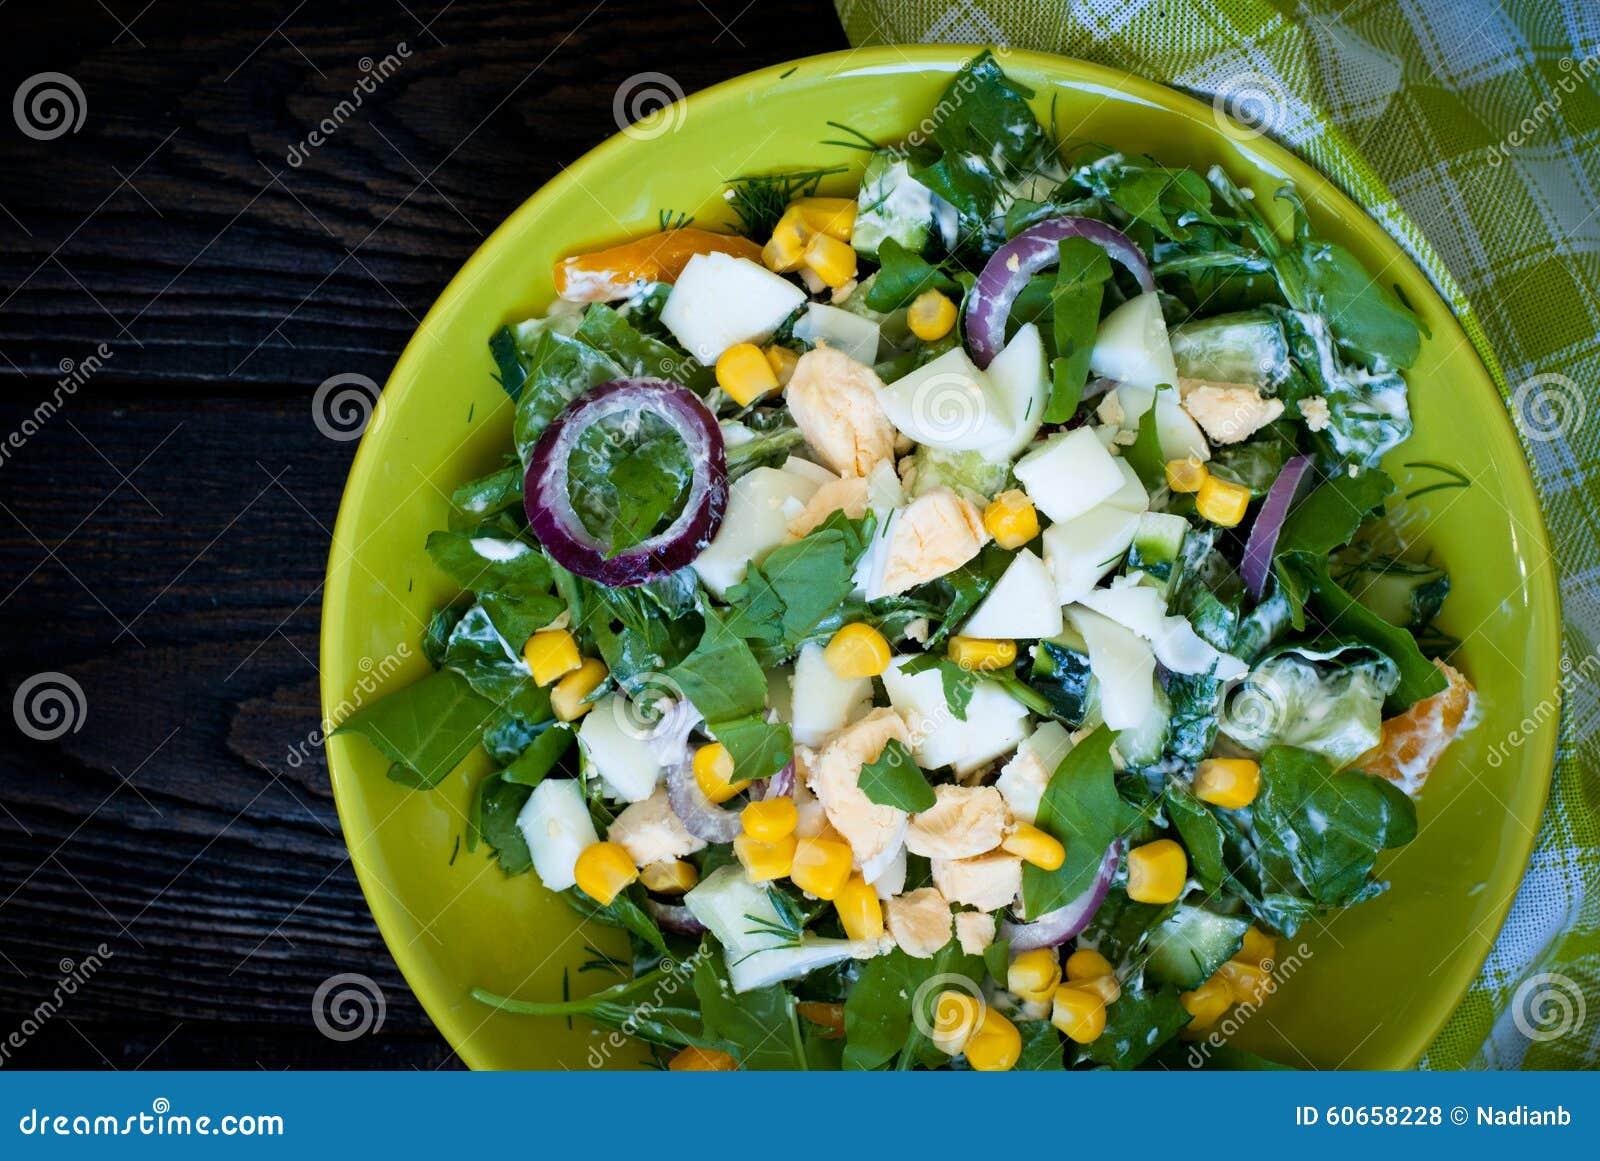 salade verte fraîche avec l'oseille photo stock - image du herbe